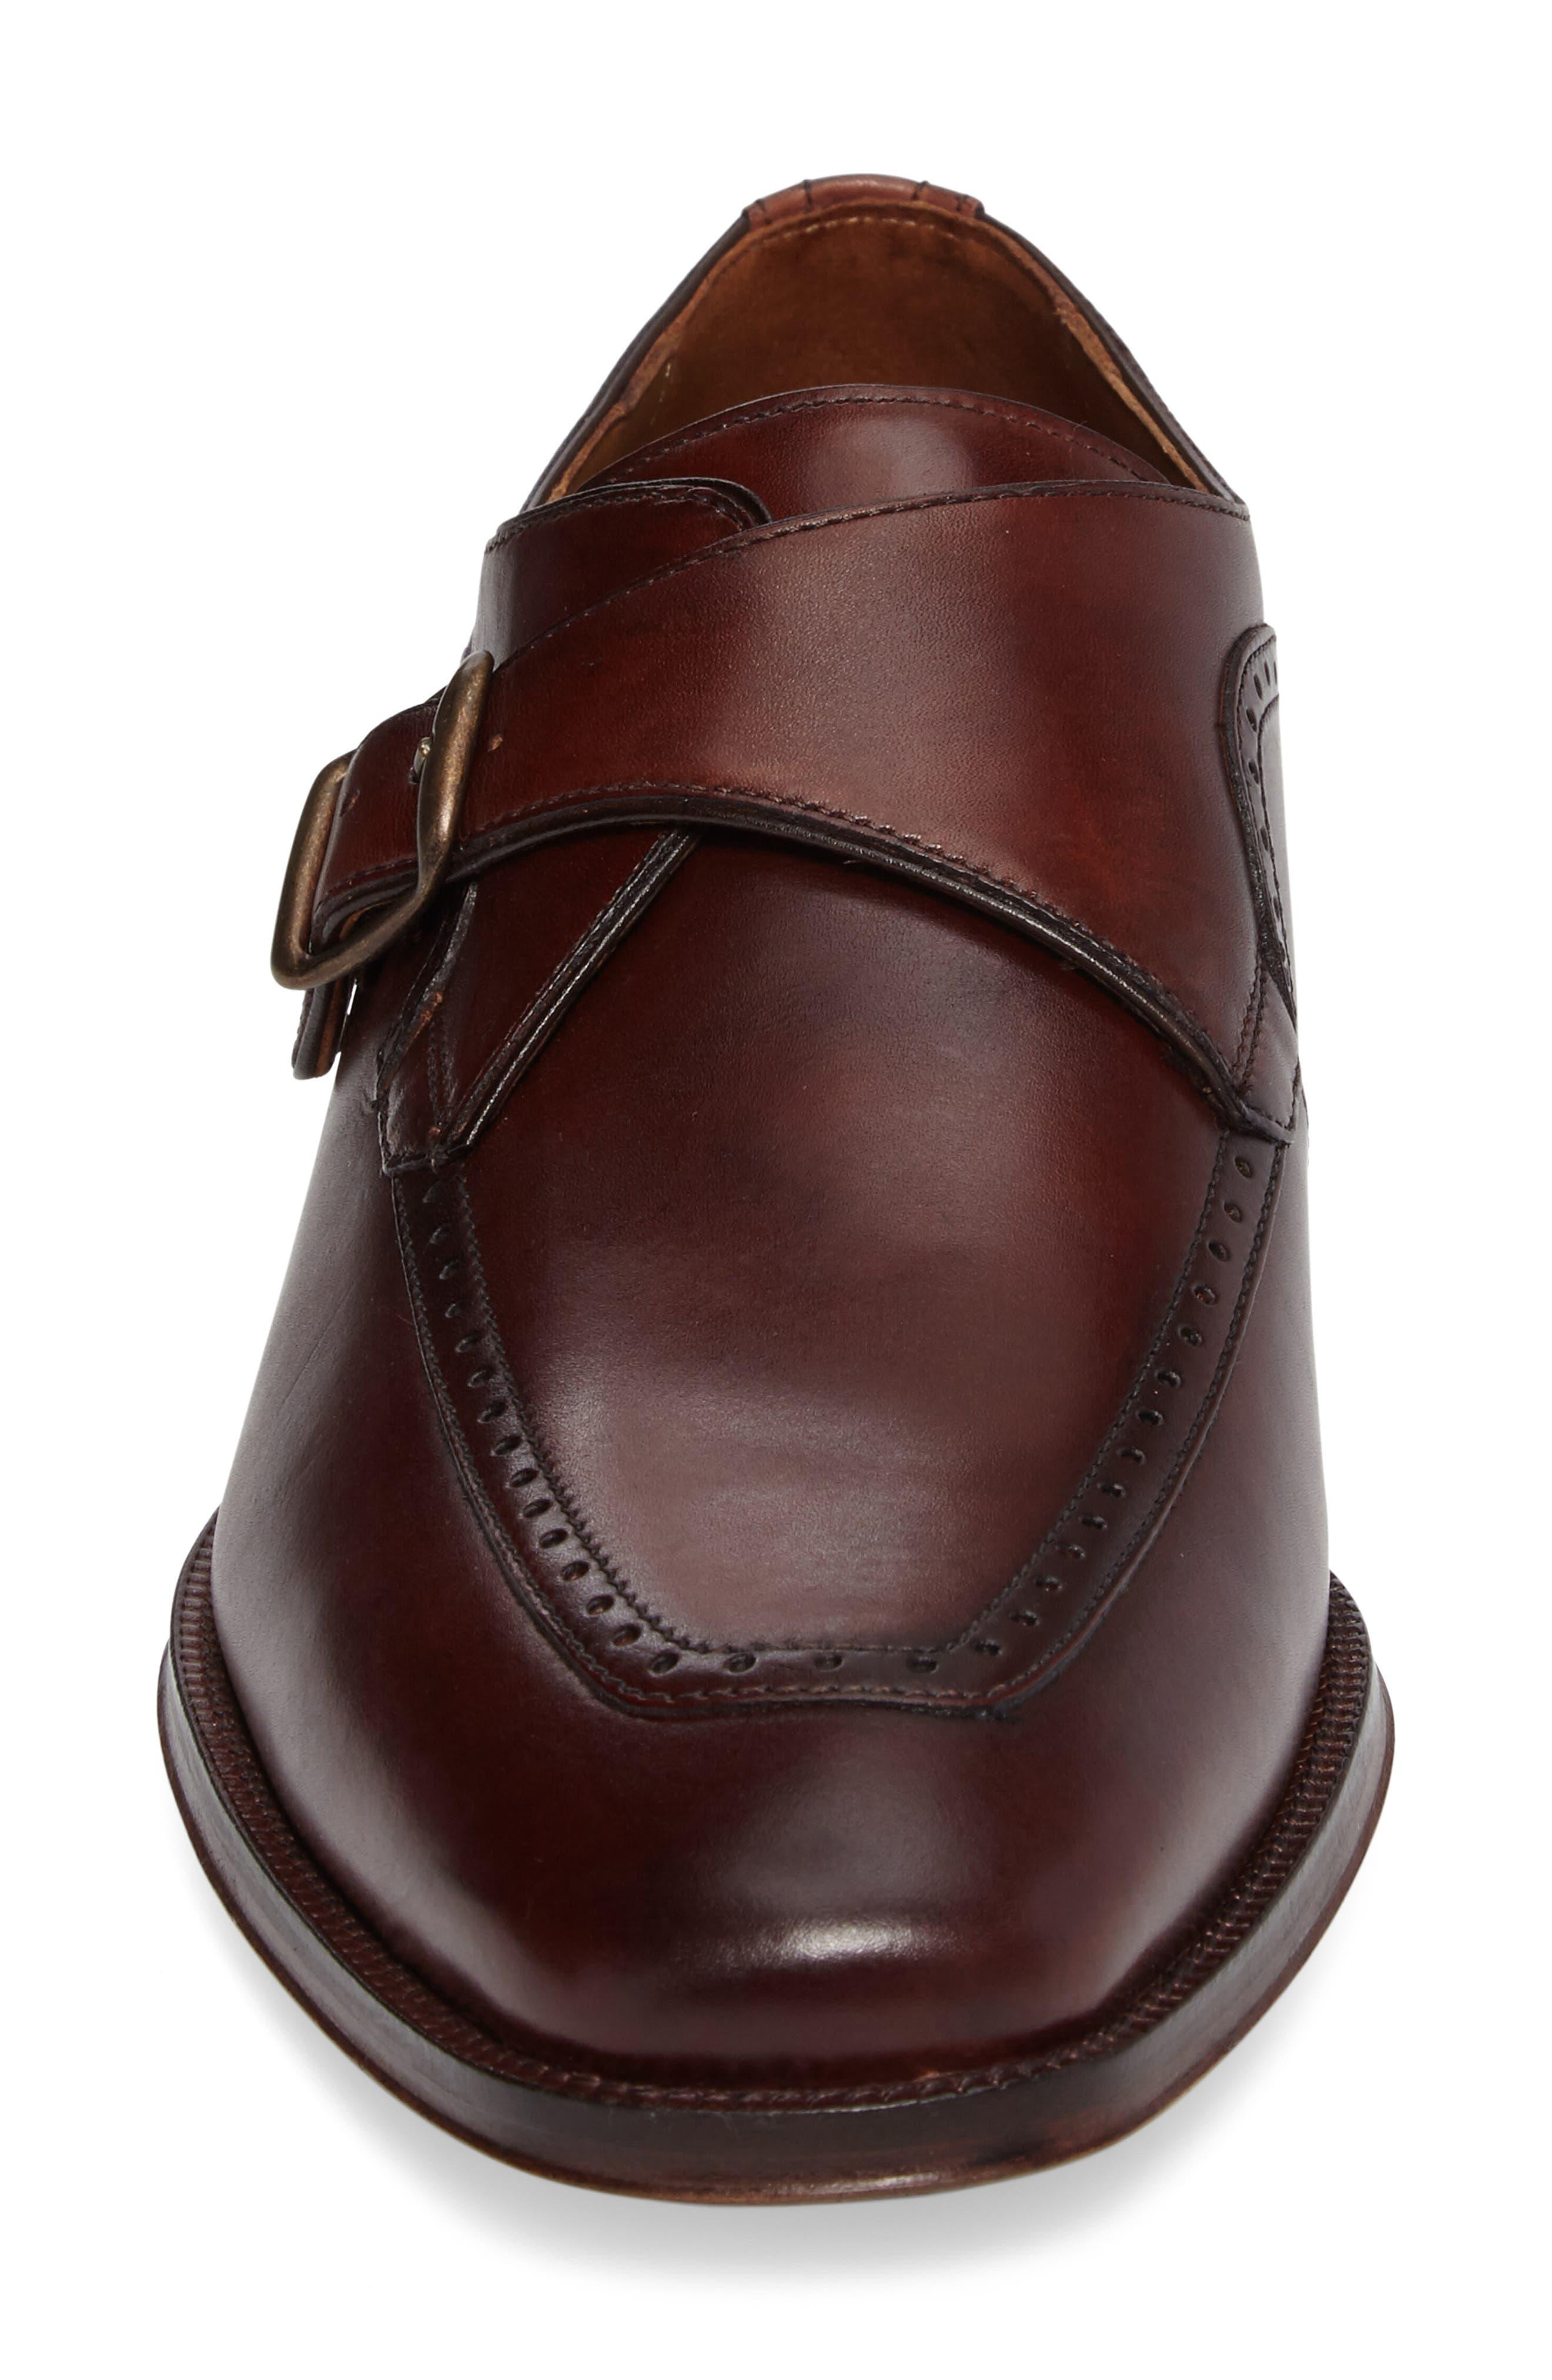 Boydstun Monk Strap Shoe,                             Alternate thumbnail 8, color,